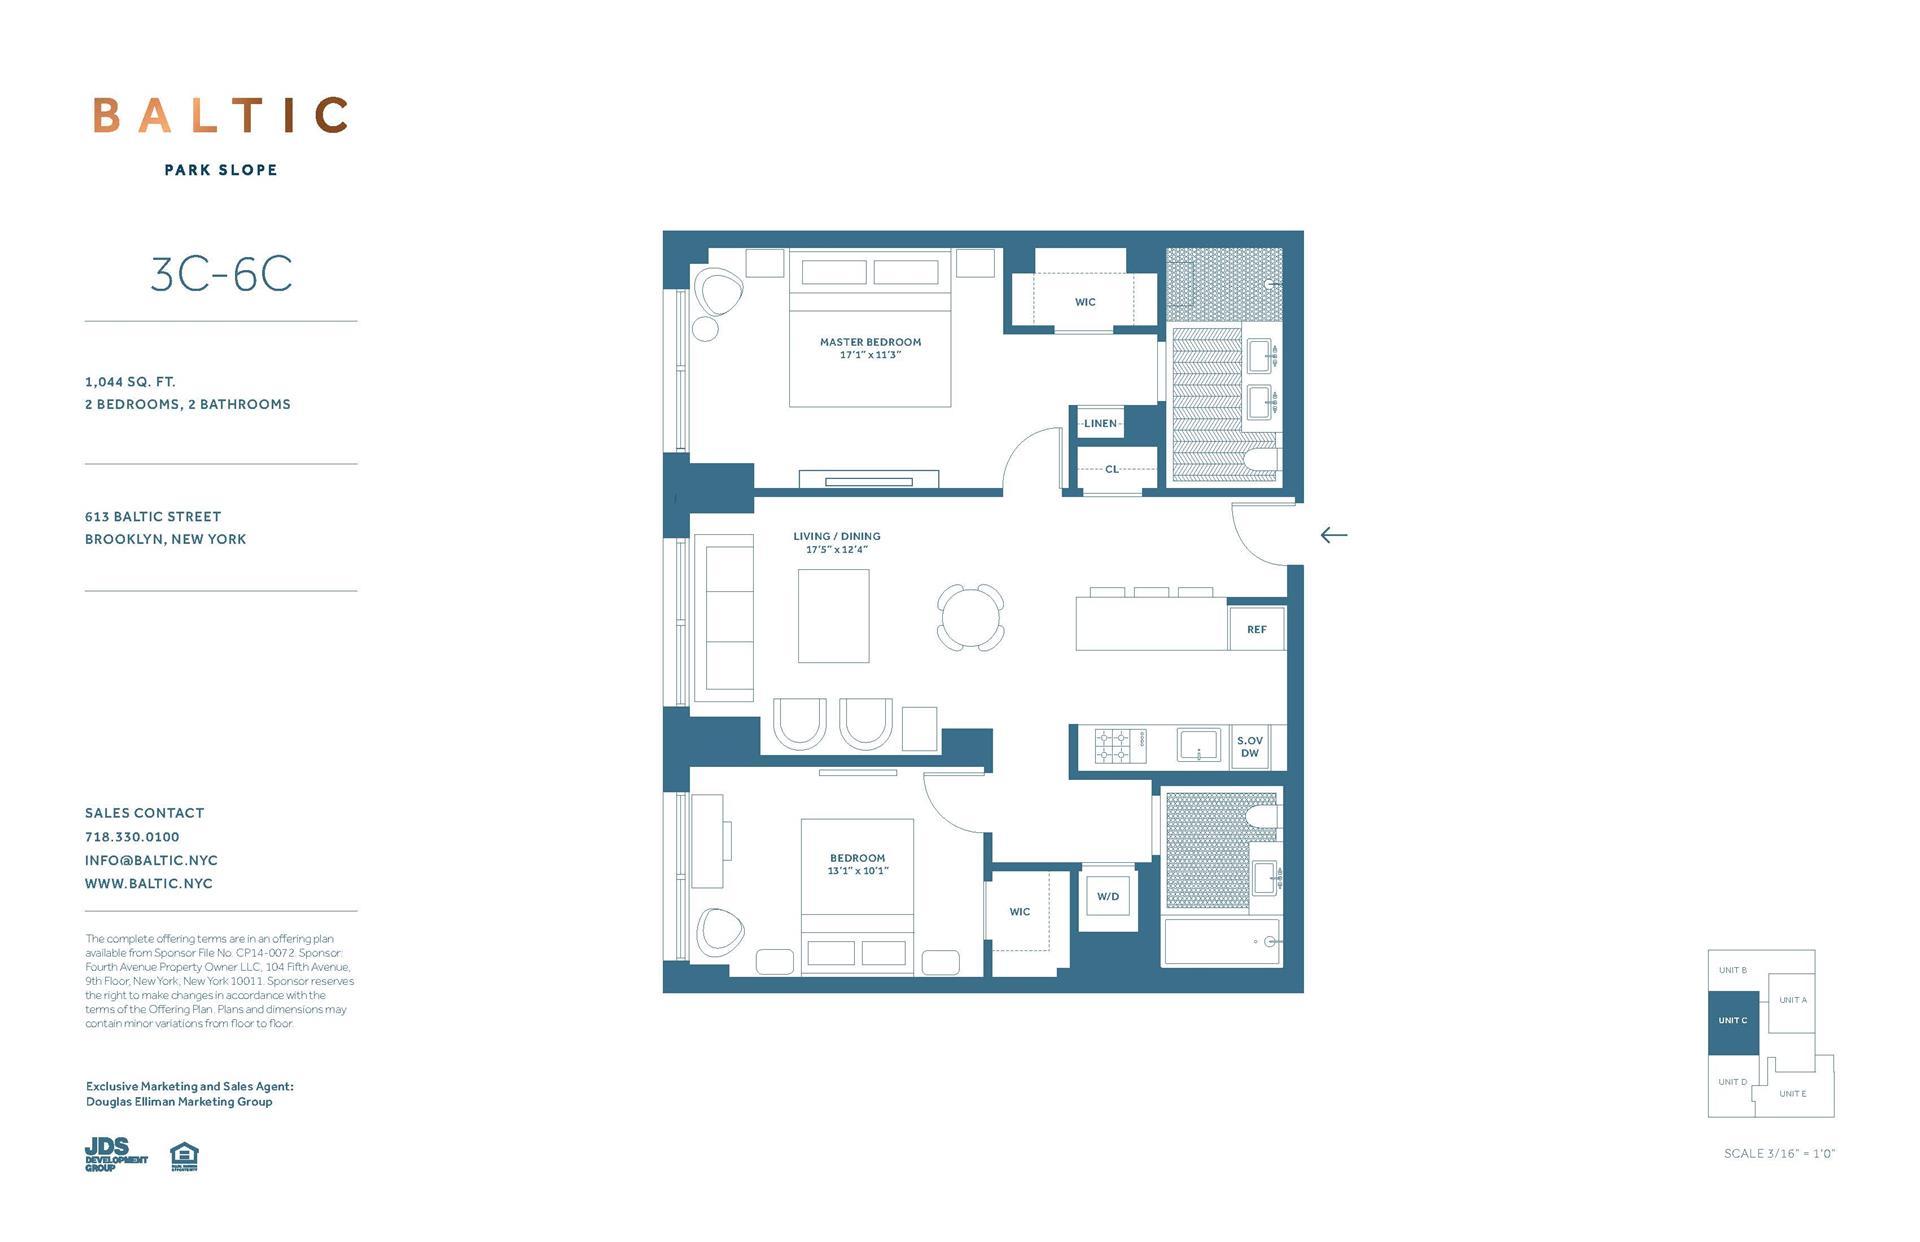 Floor plan of 613 Baltic St, 4C - Park Slope, New York